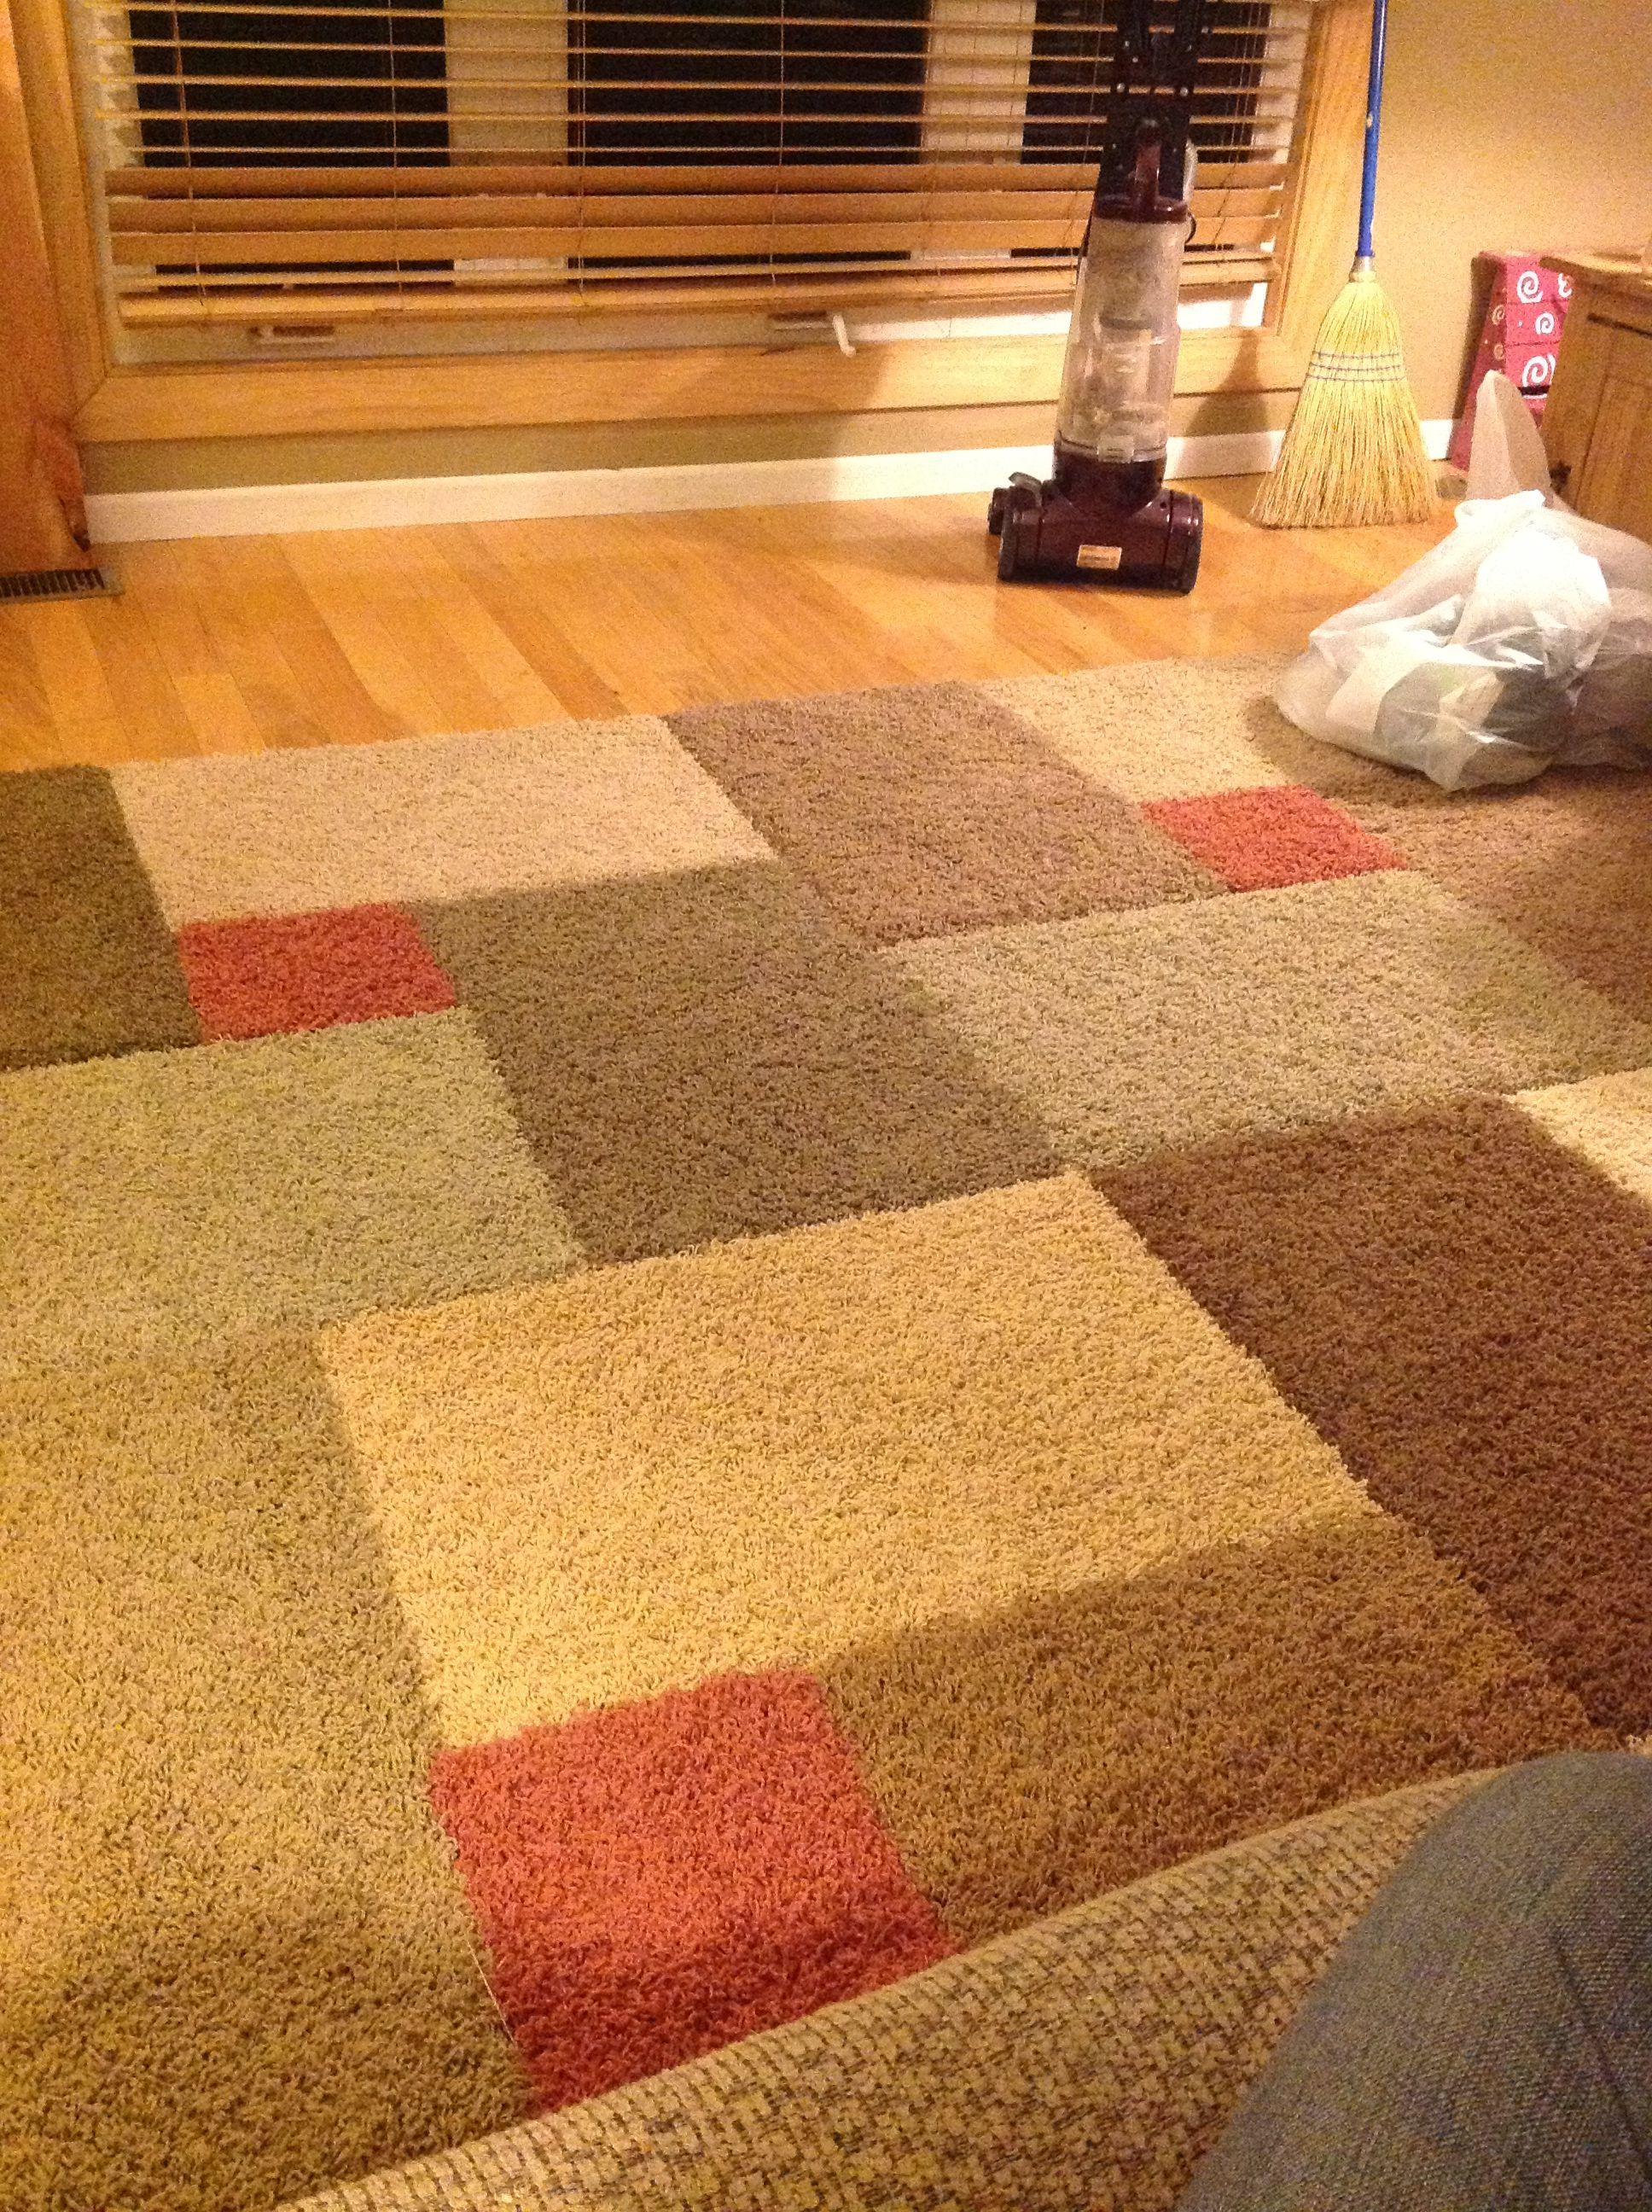 crafty design teal area rug. Our  20 DIY area rug Carpet samples razor knife carpet seam tape